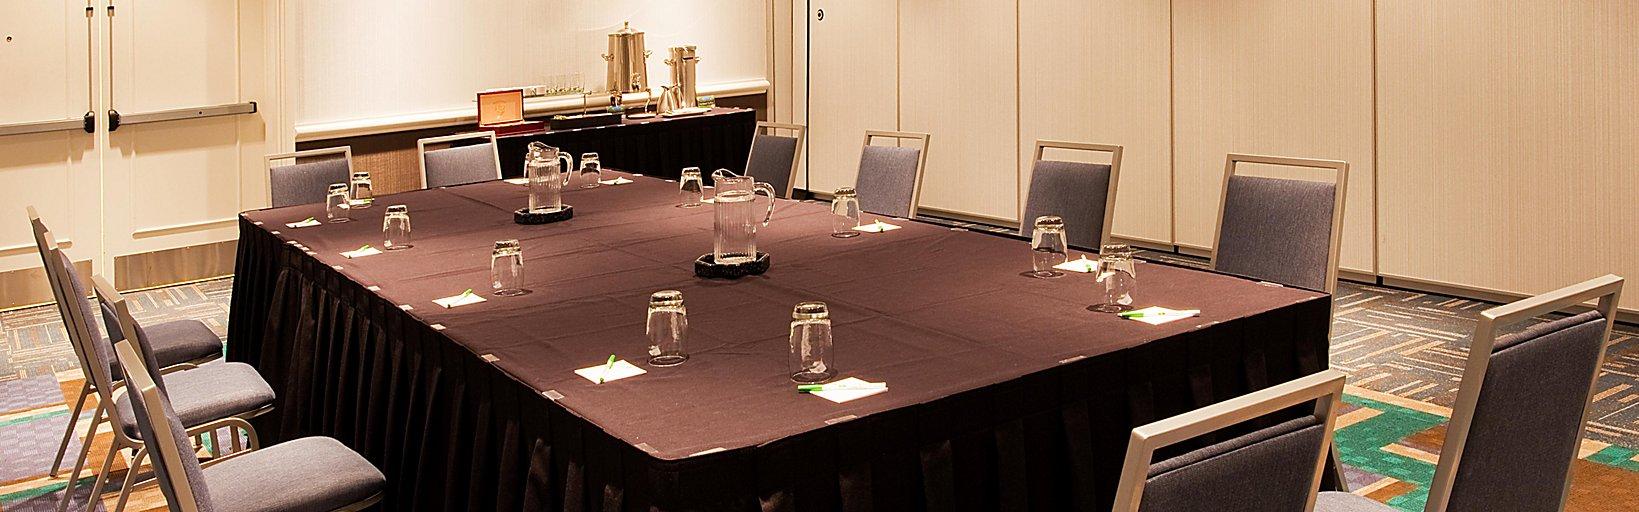 Holiday Inn Orlando-Disney Springs® Area - Hotel Groups & Meeting